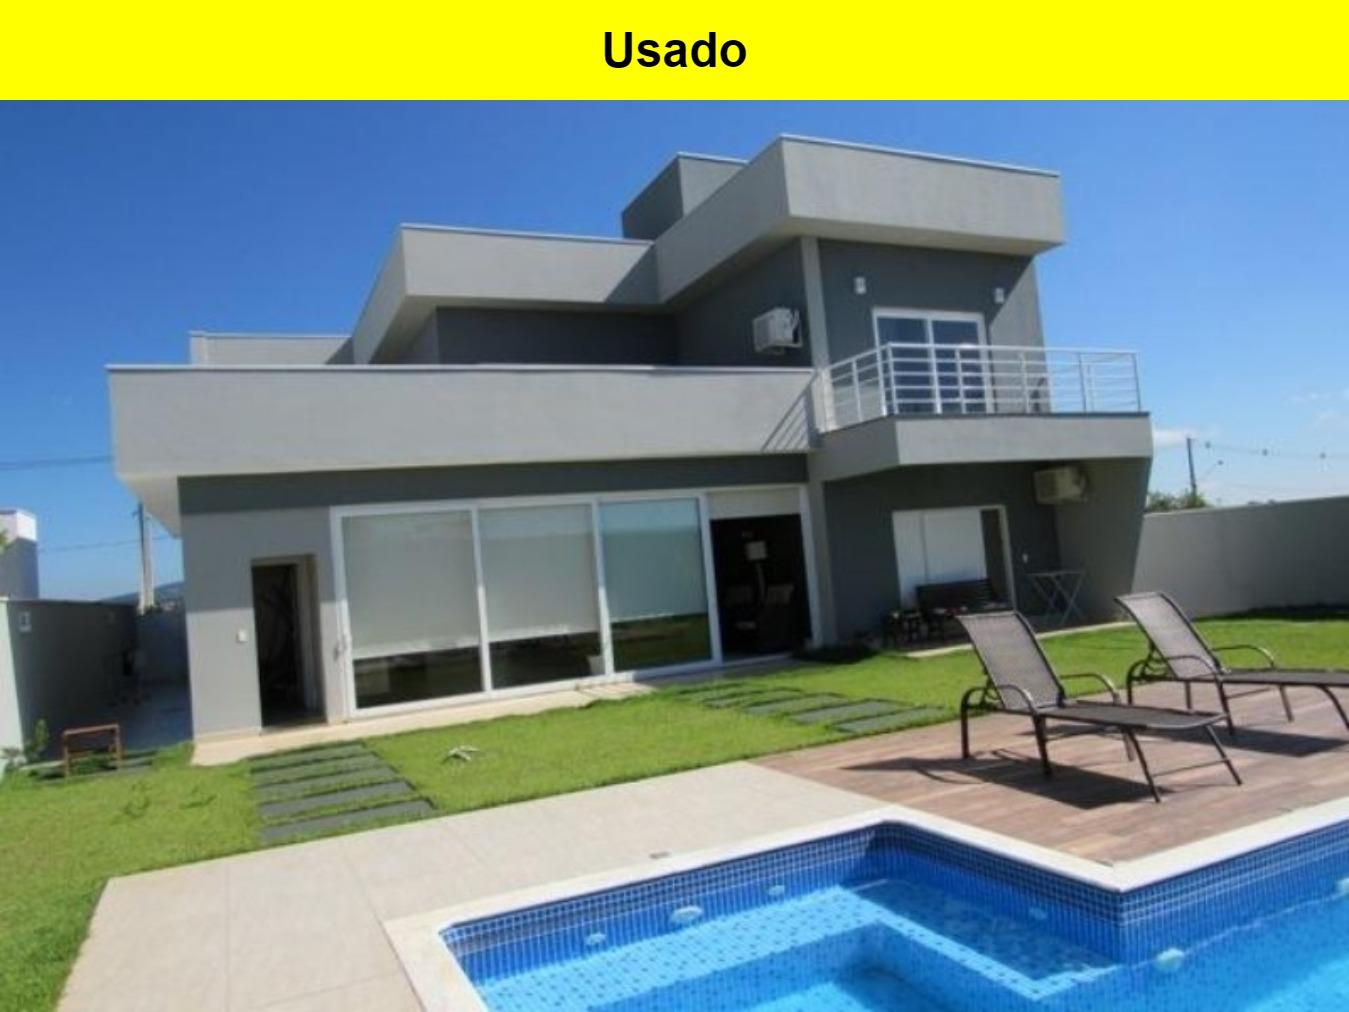 Casa a venda no condomínio Evidence, Araçoiaba da Serra - SP